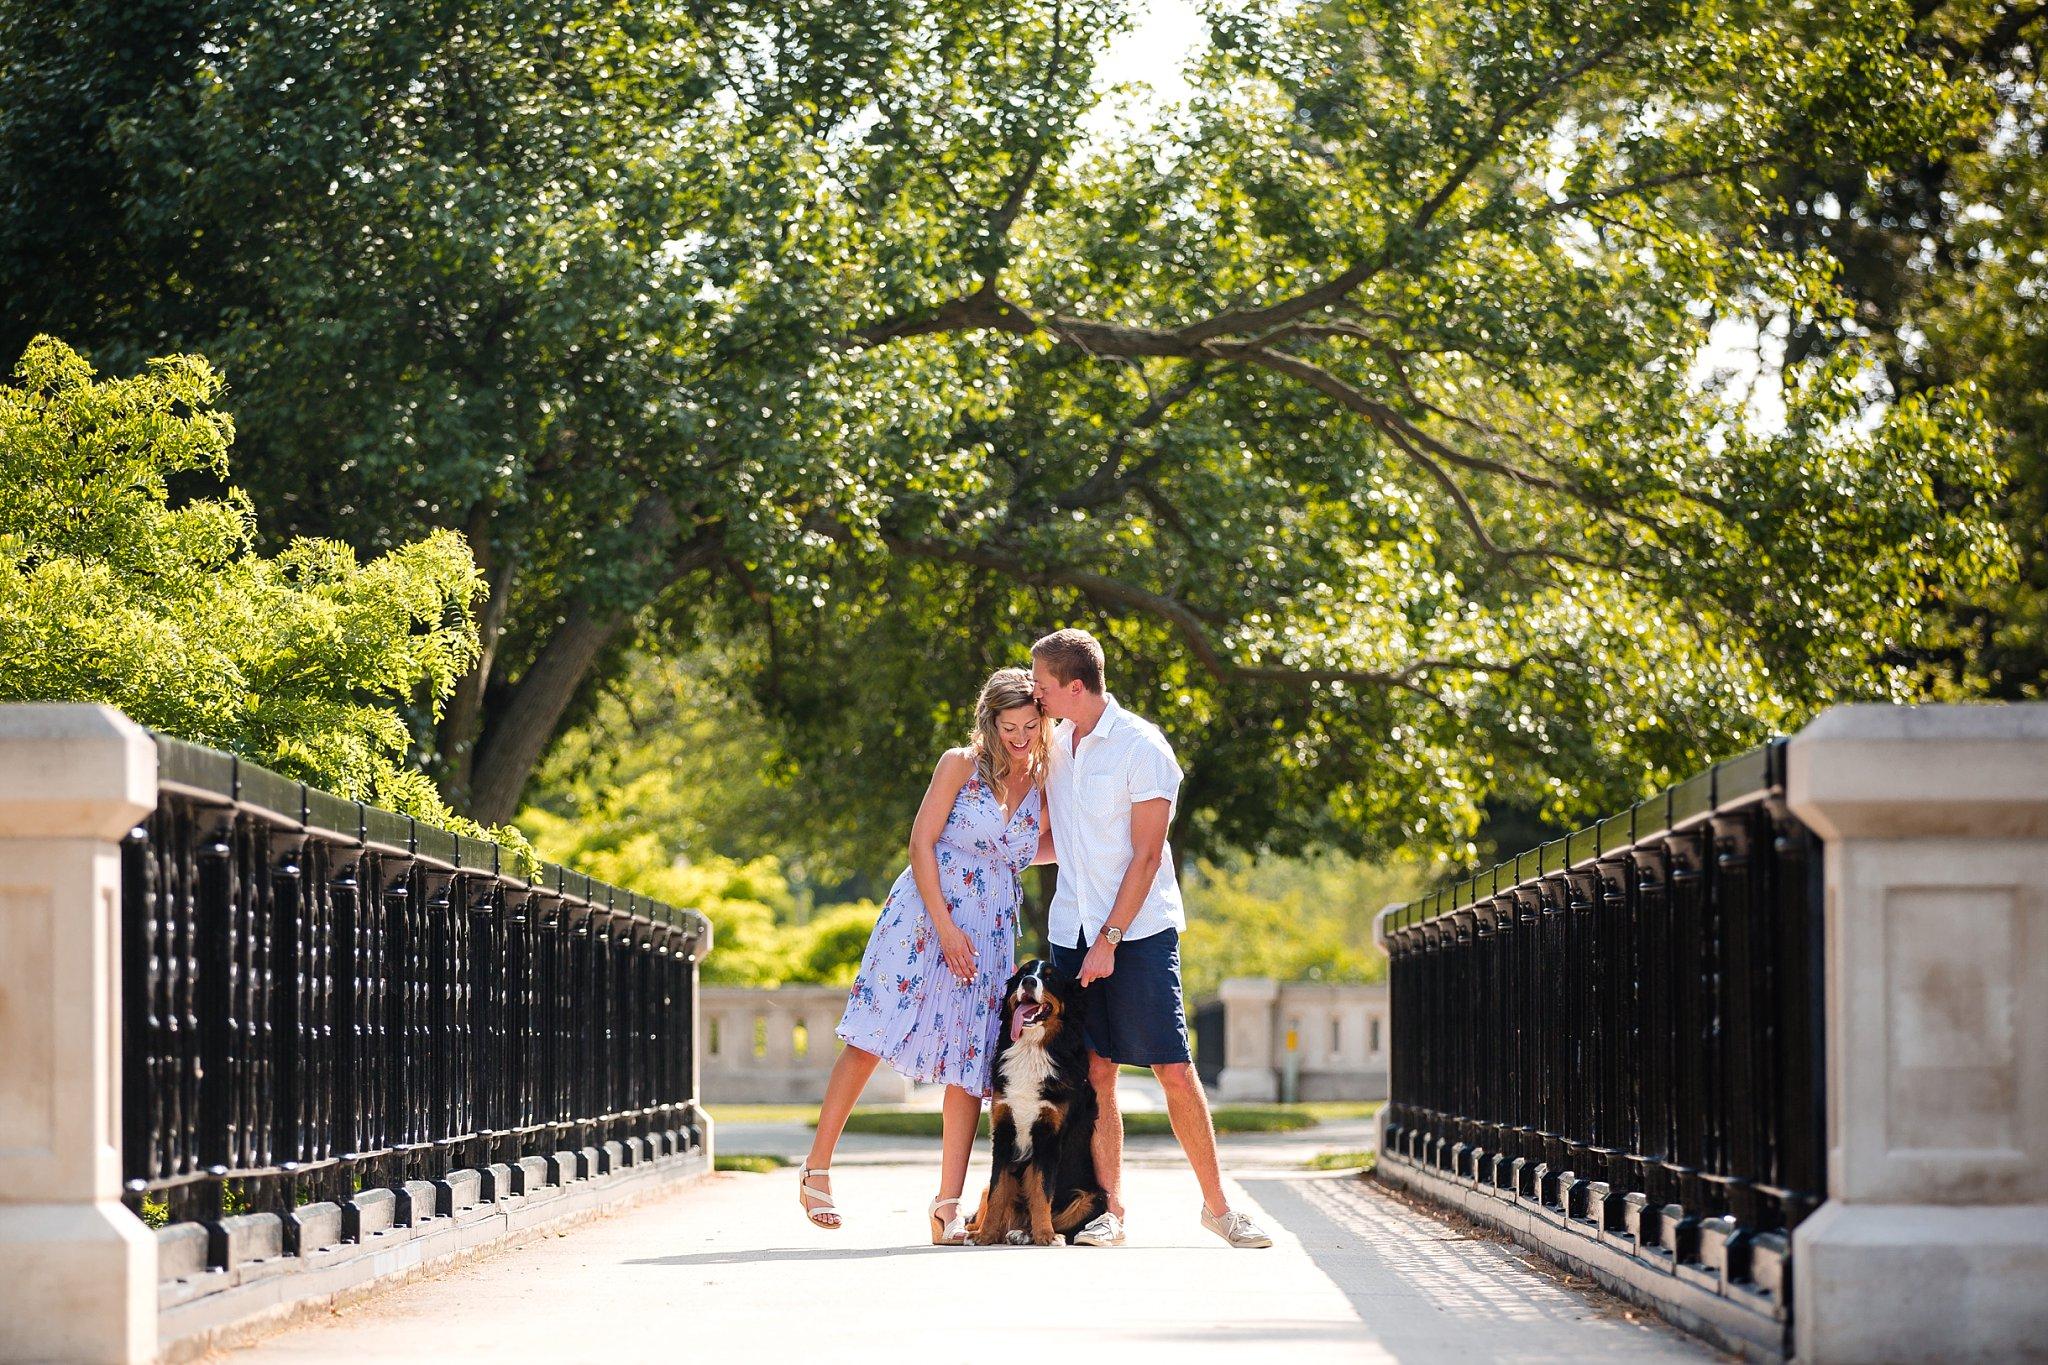 Lake Park_Engagement Photographer_With bernese mountain dog